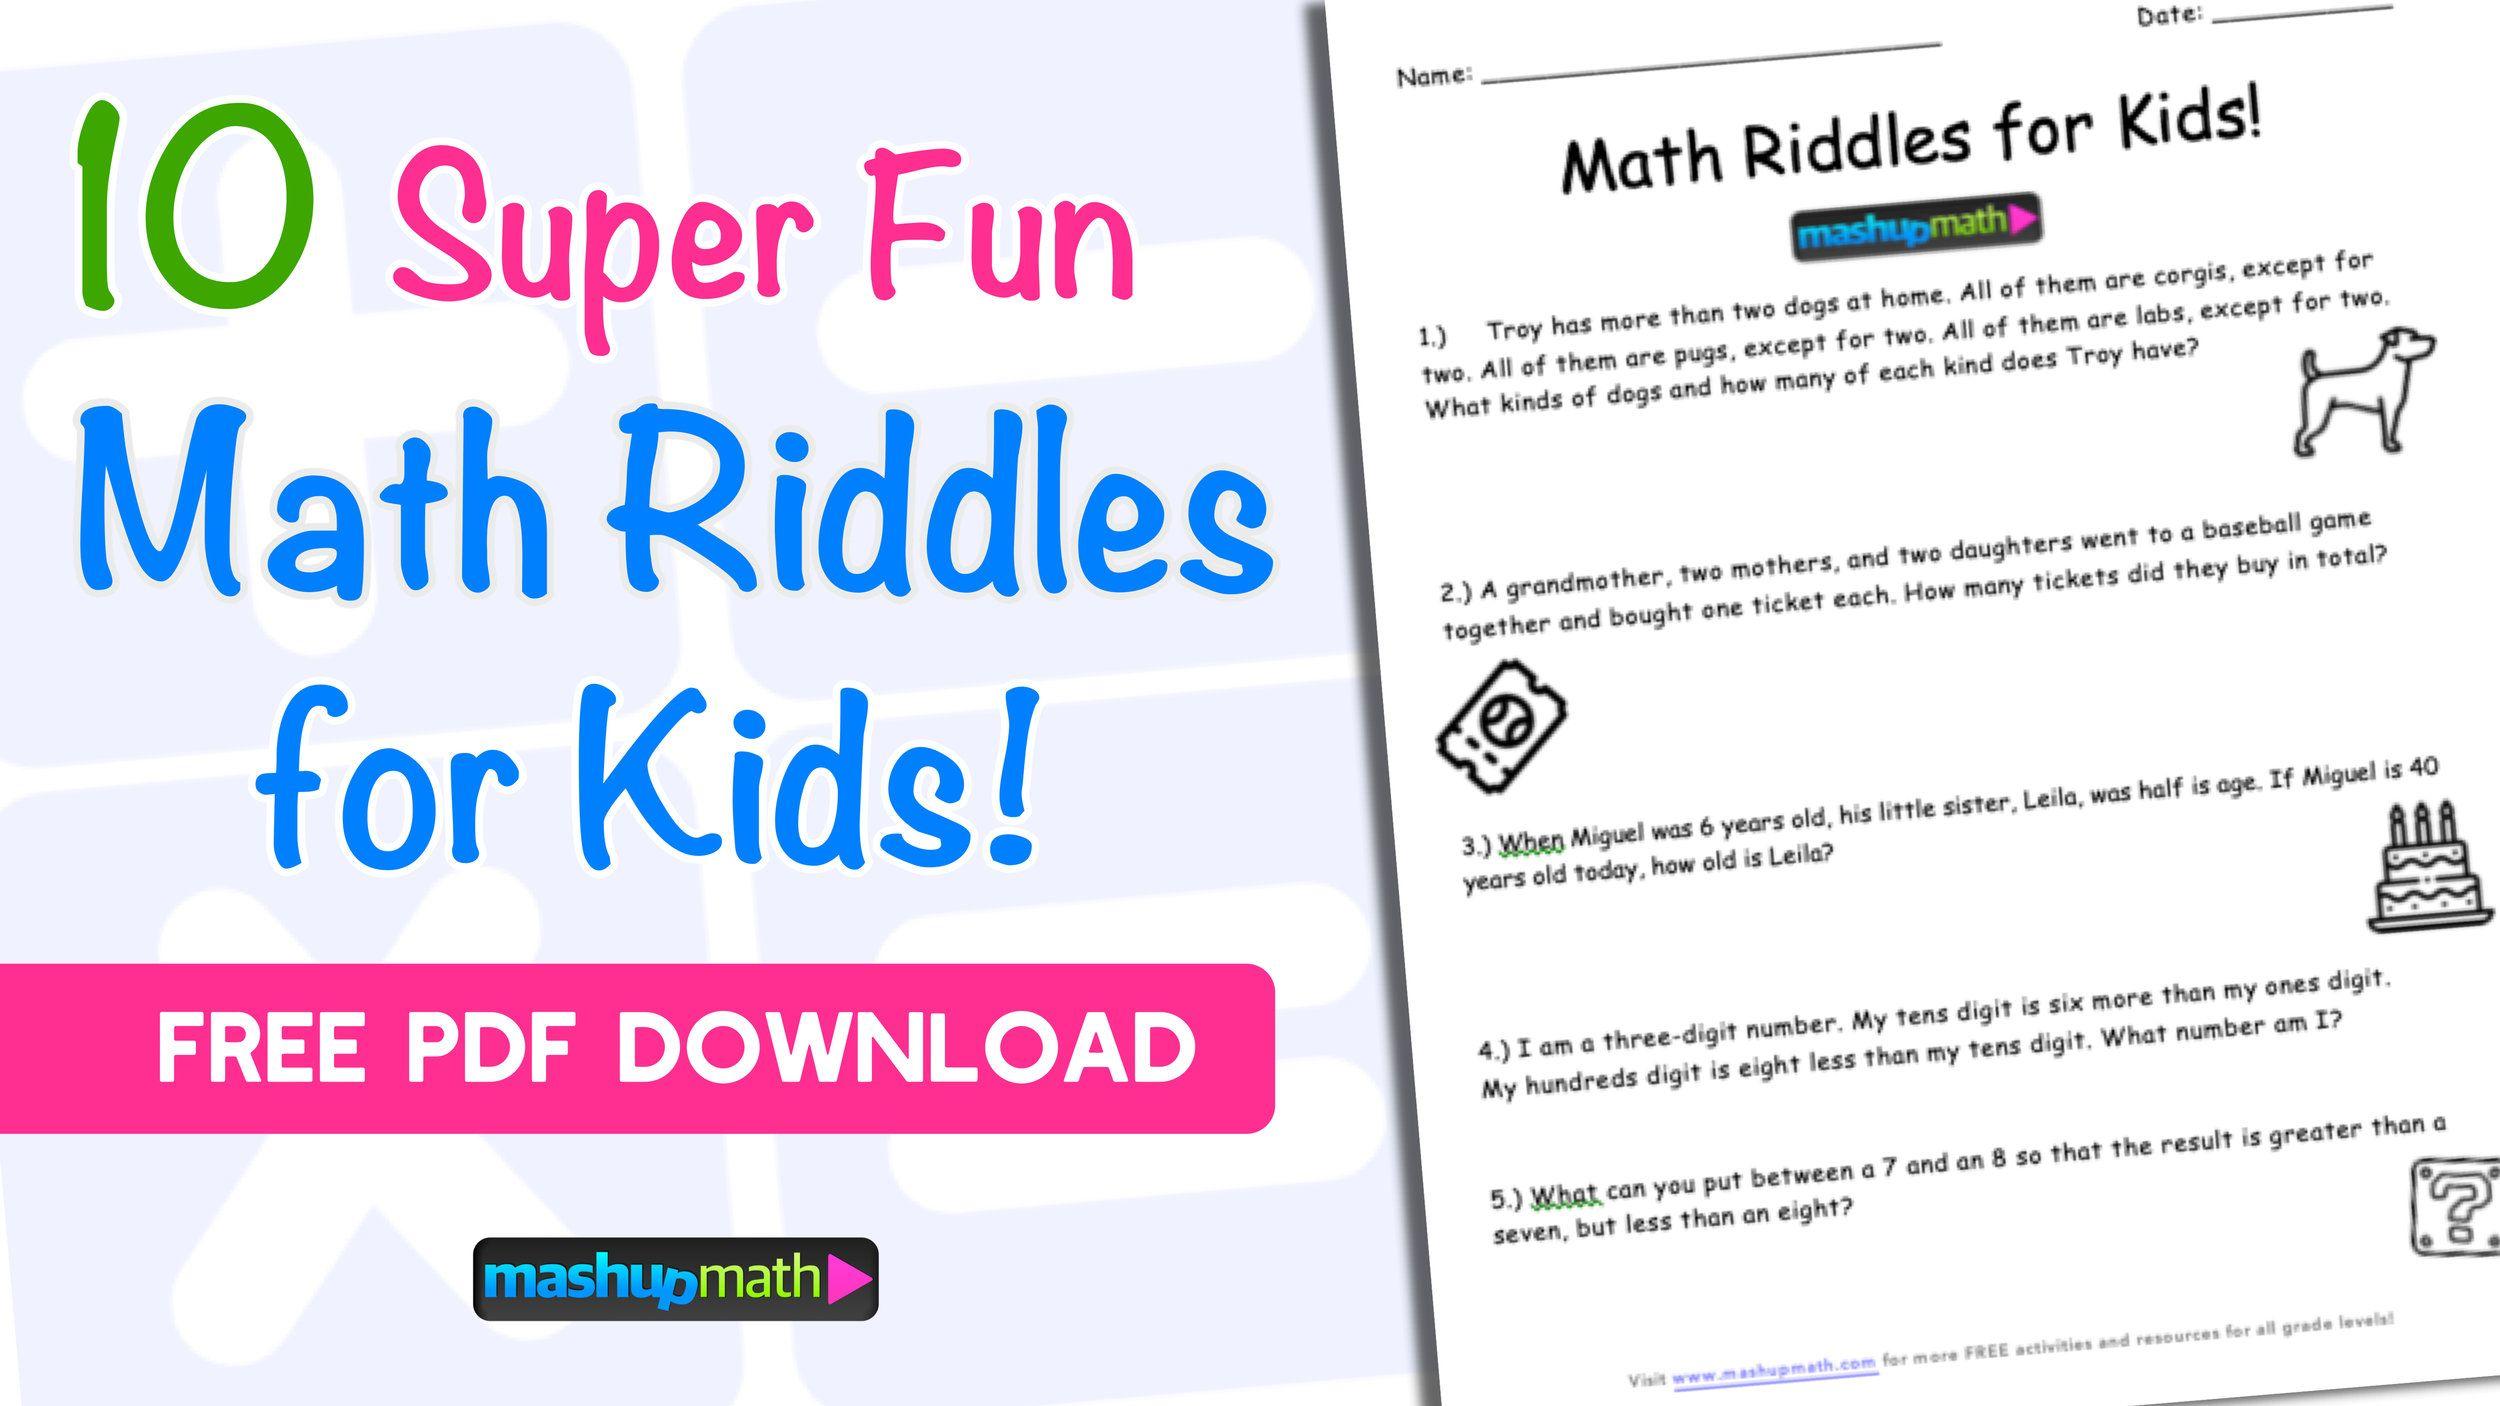 10 Super Fun Math Riddles For Kids Ages 10 With Answers Mashup Math Math Riddles Math Riddles With Answers Fun Math